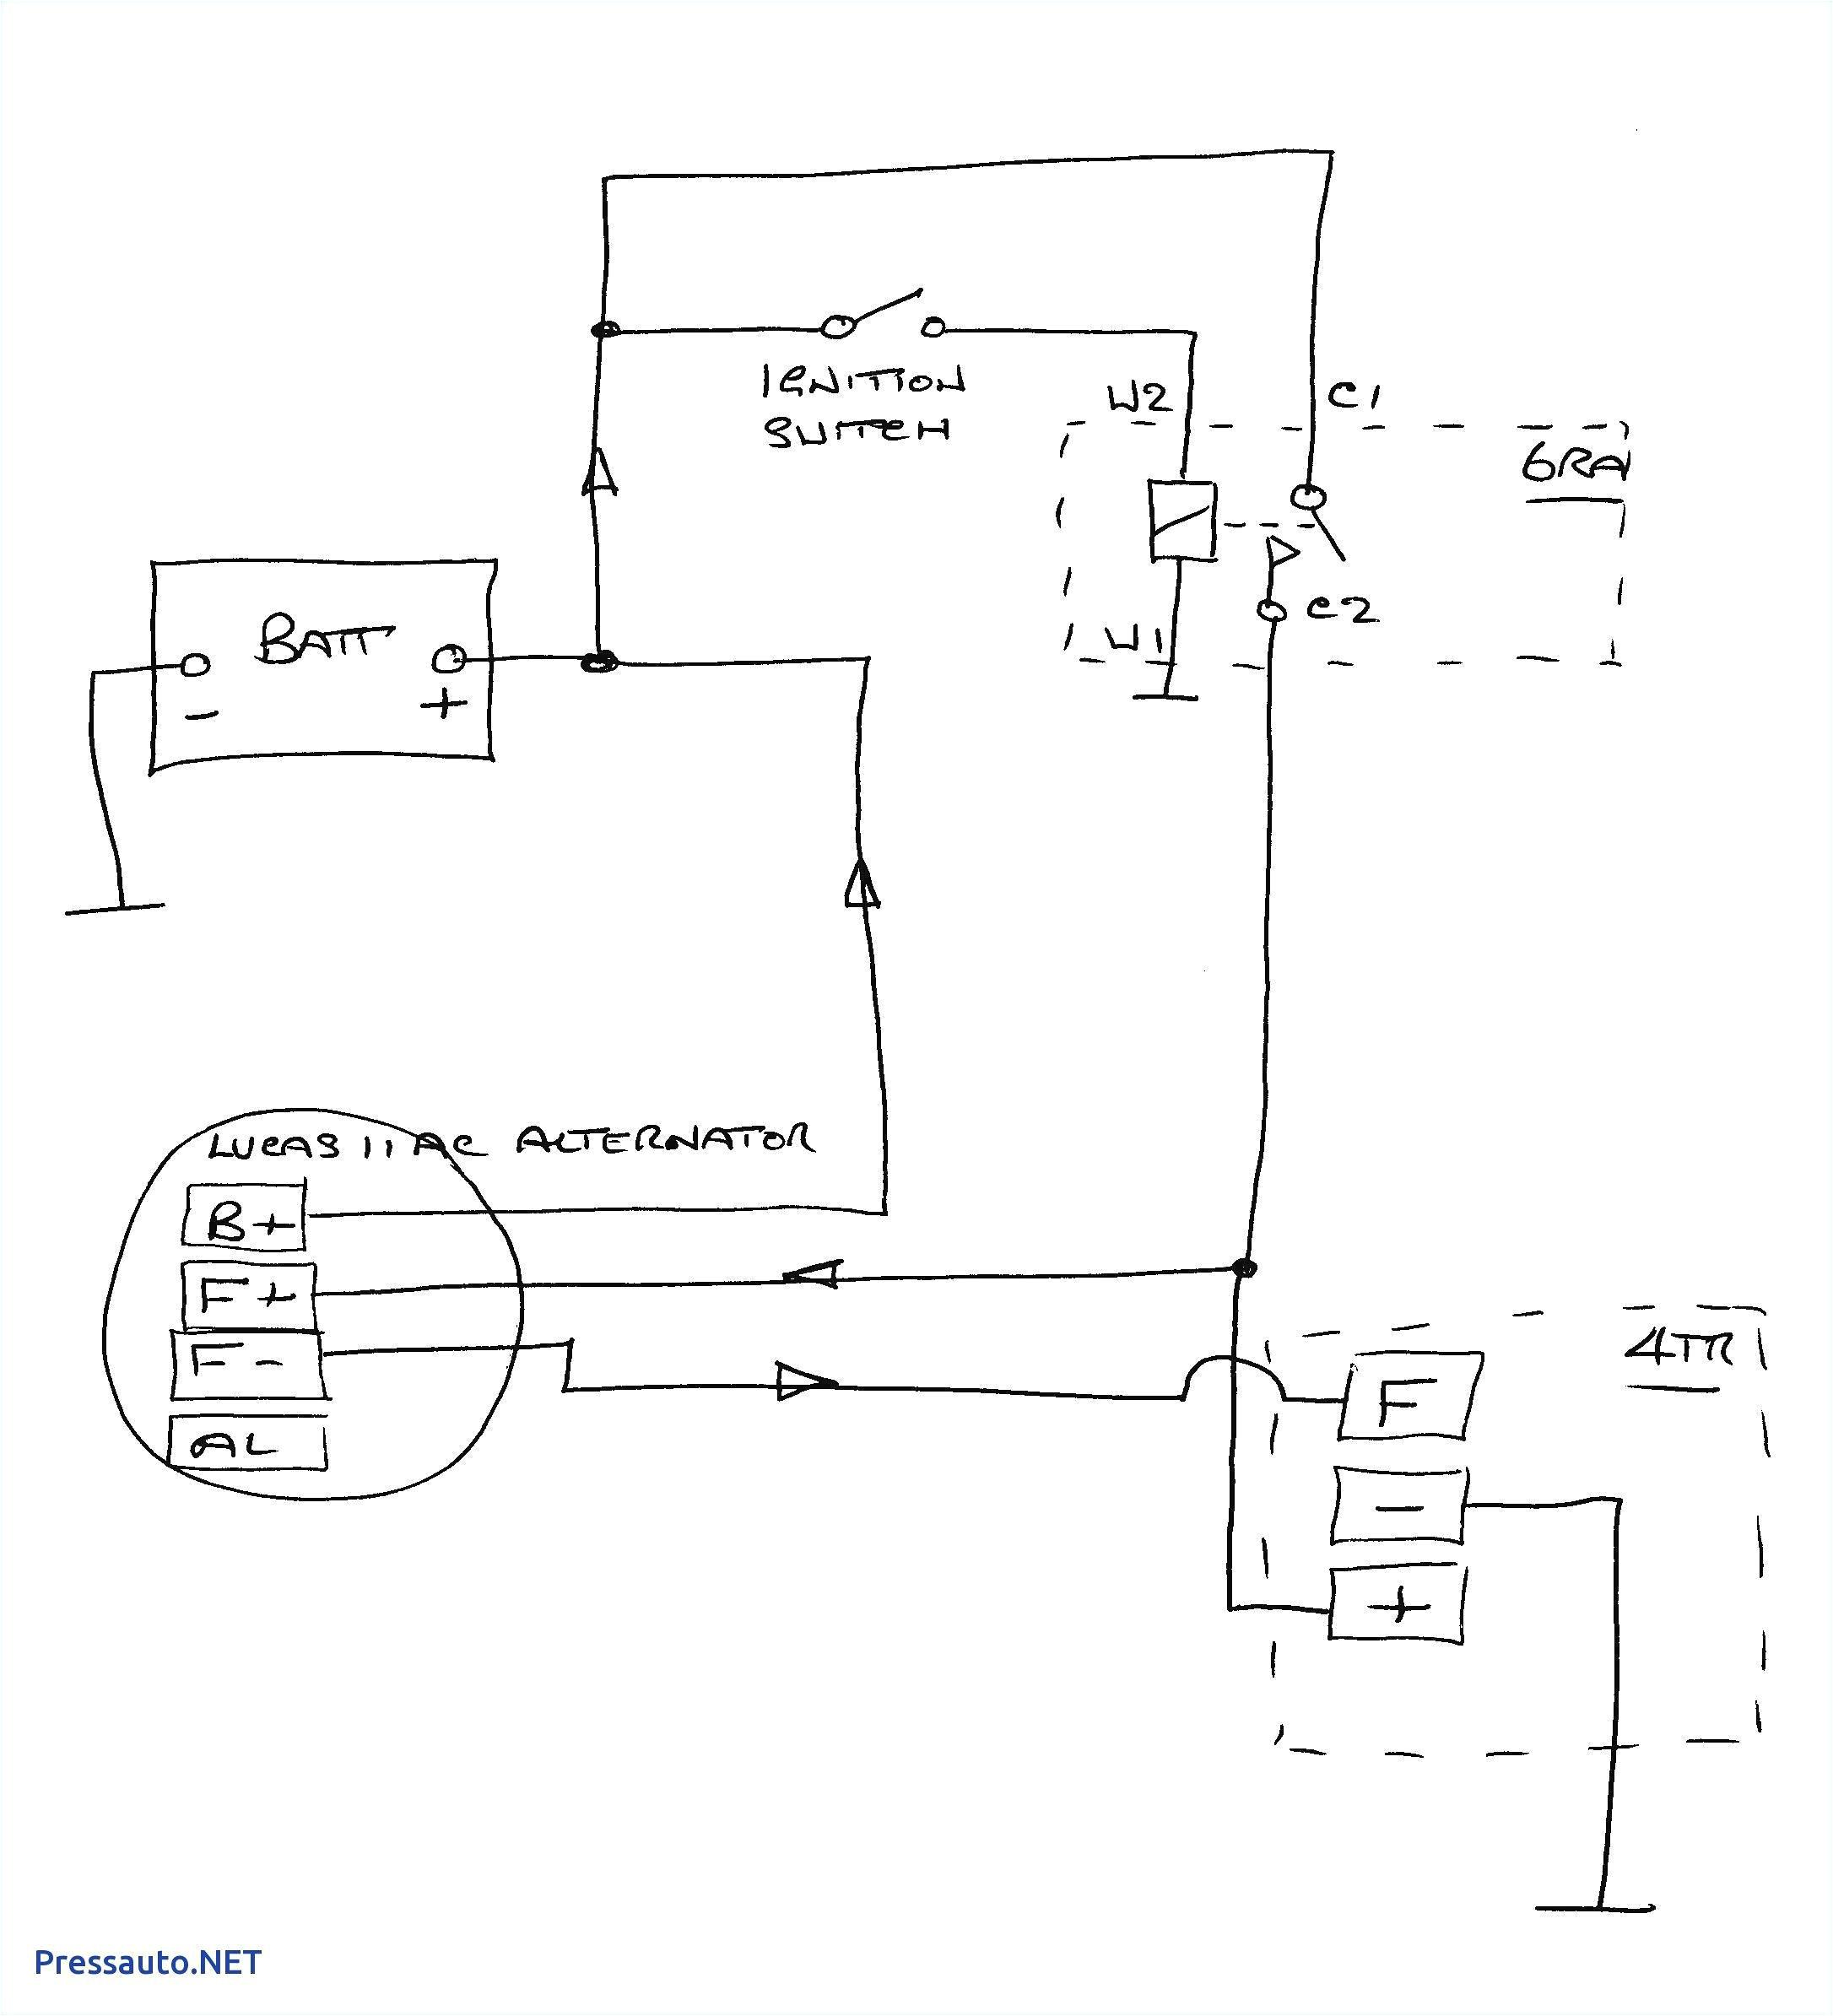 wiring diagram a127 lucas alternator wiring diagram toolbox lucas alternator wiring 15tr